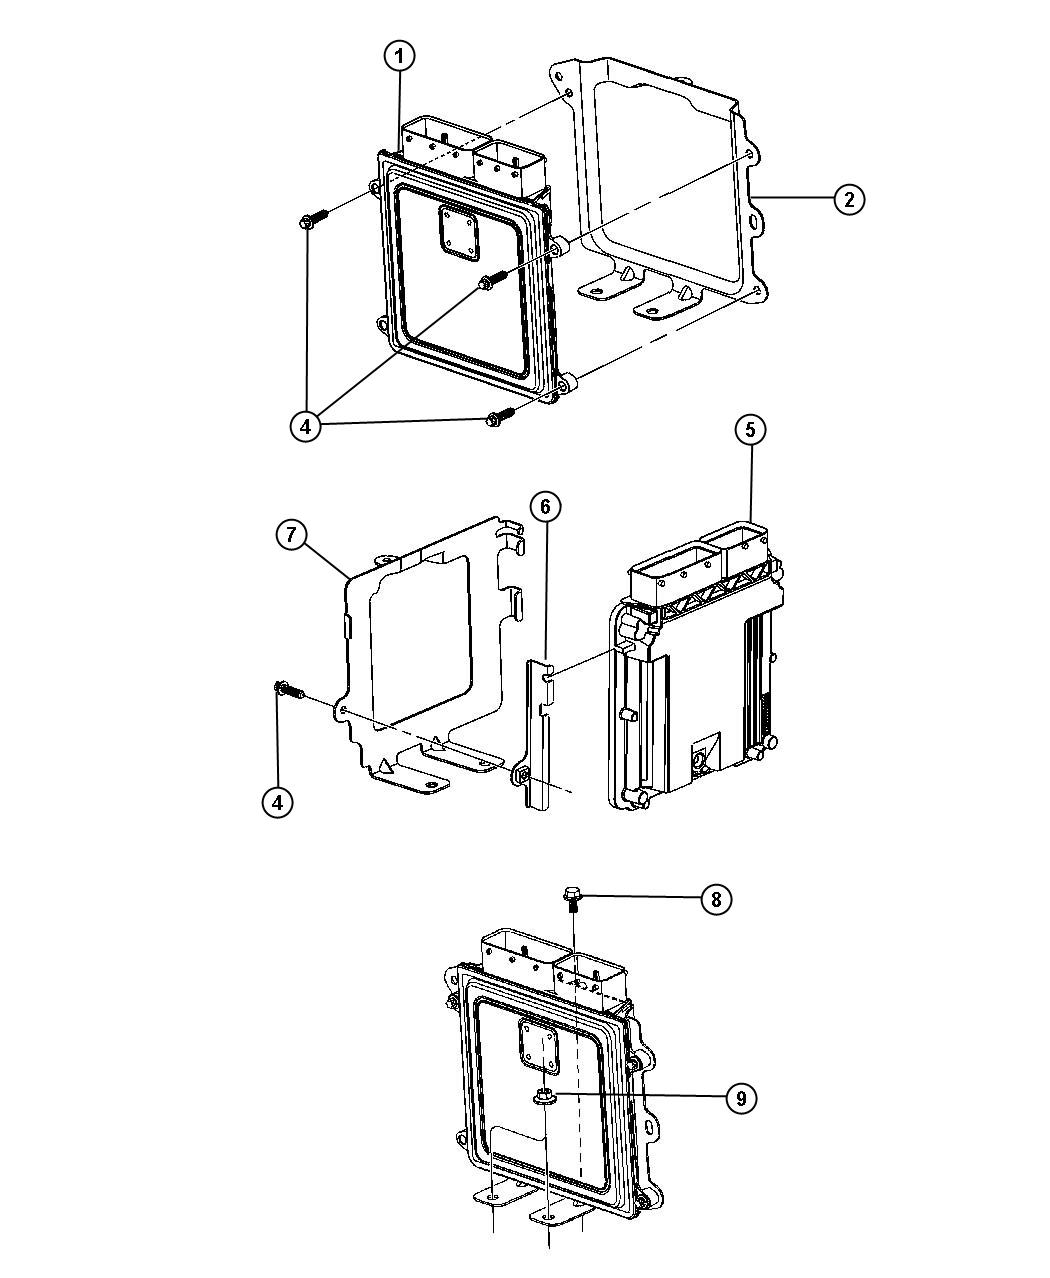 06104077aa jeep screw powertrain control module to. Black Bedroom Furniture Sets. Home Design Ideas